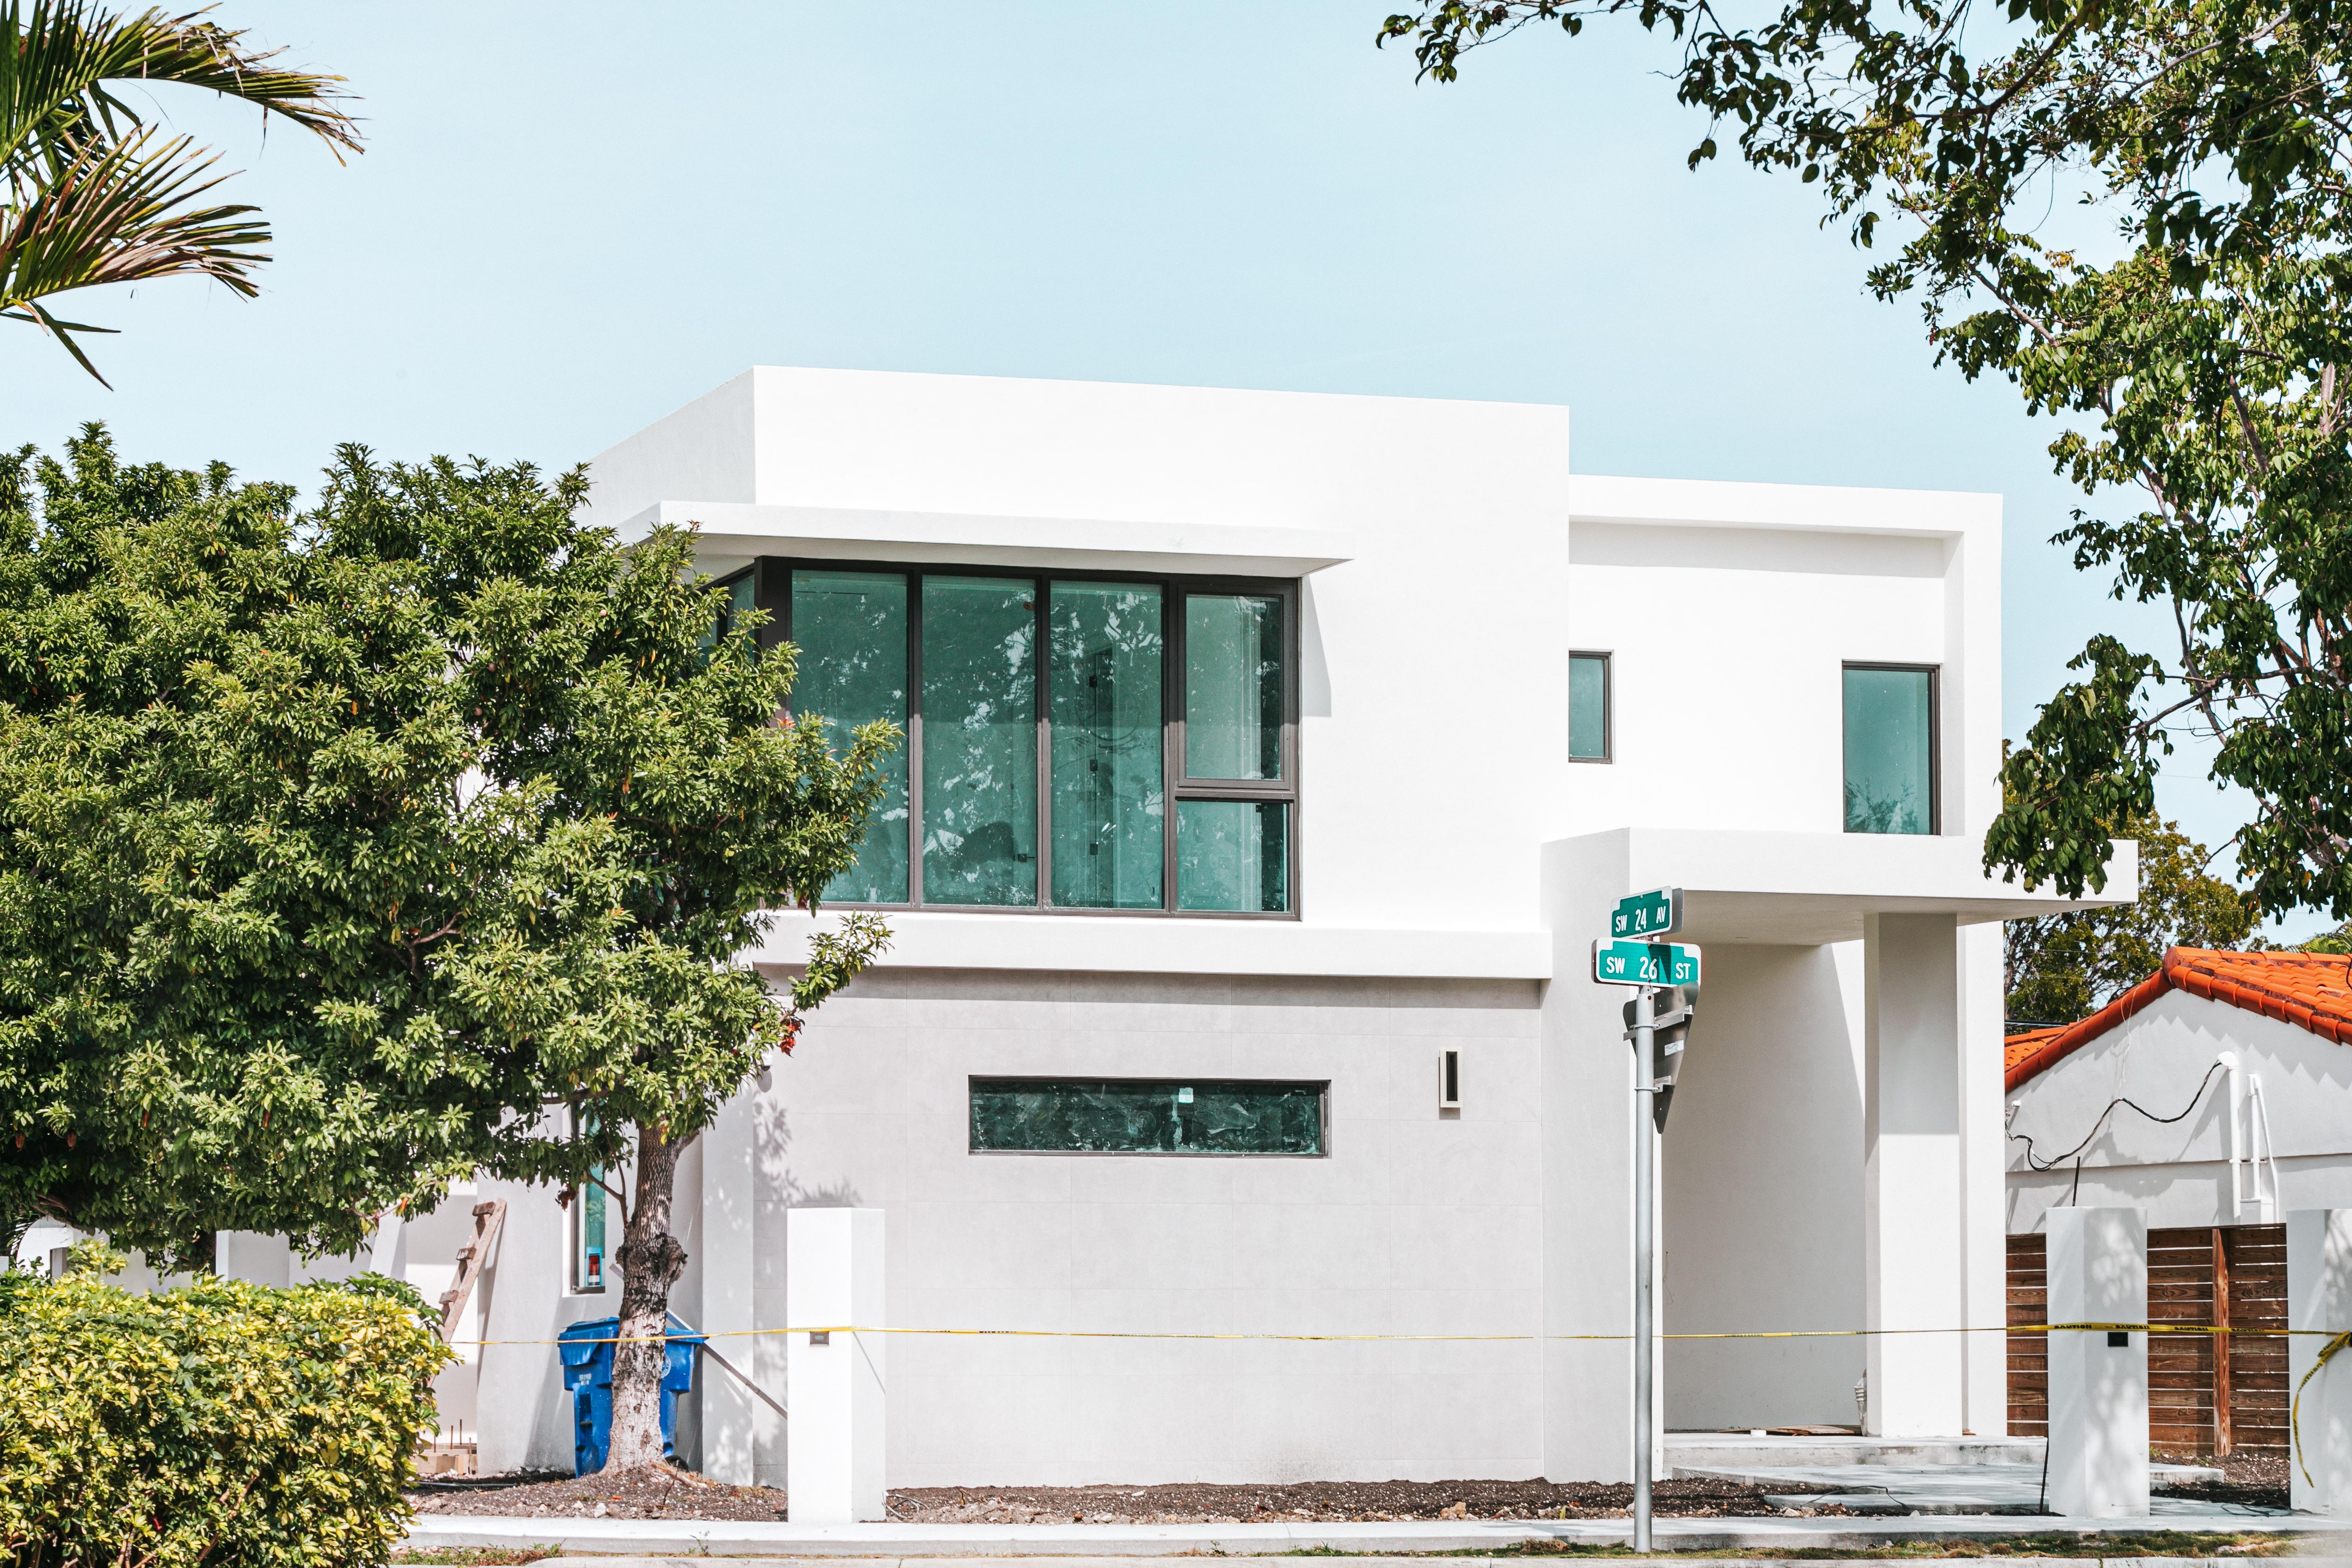 Exterior Maintenance: 7 Exterior Home Improvement to Consider This Fall